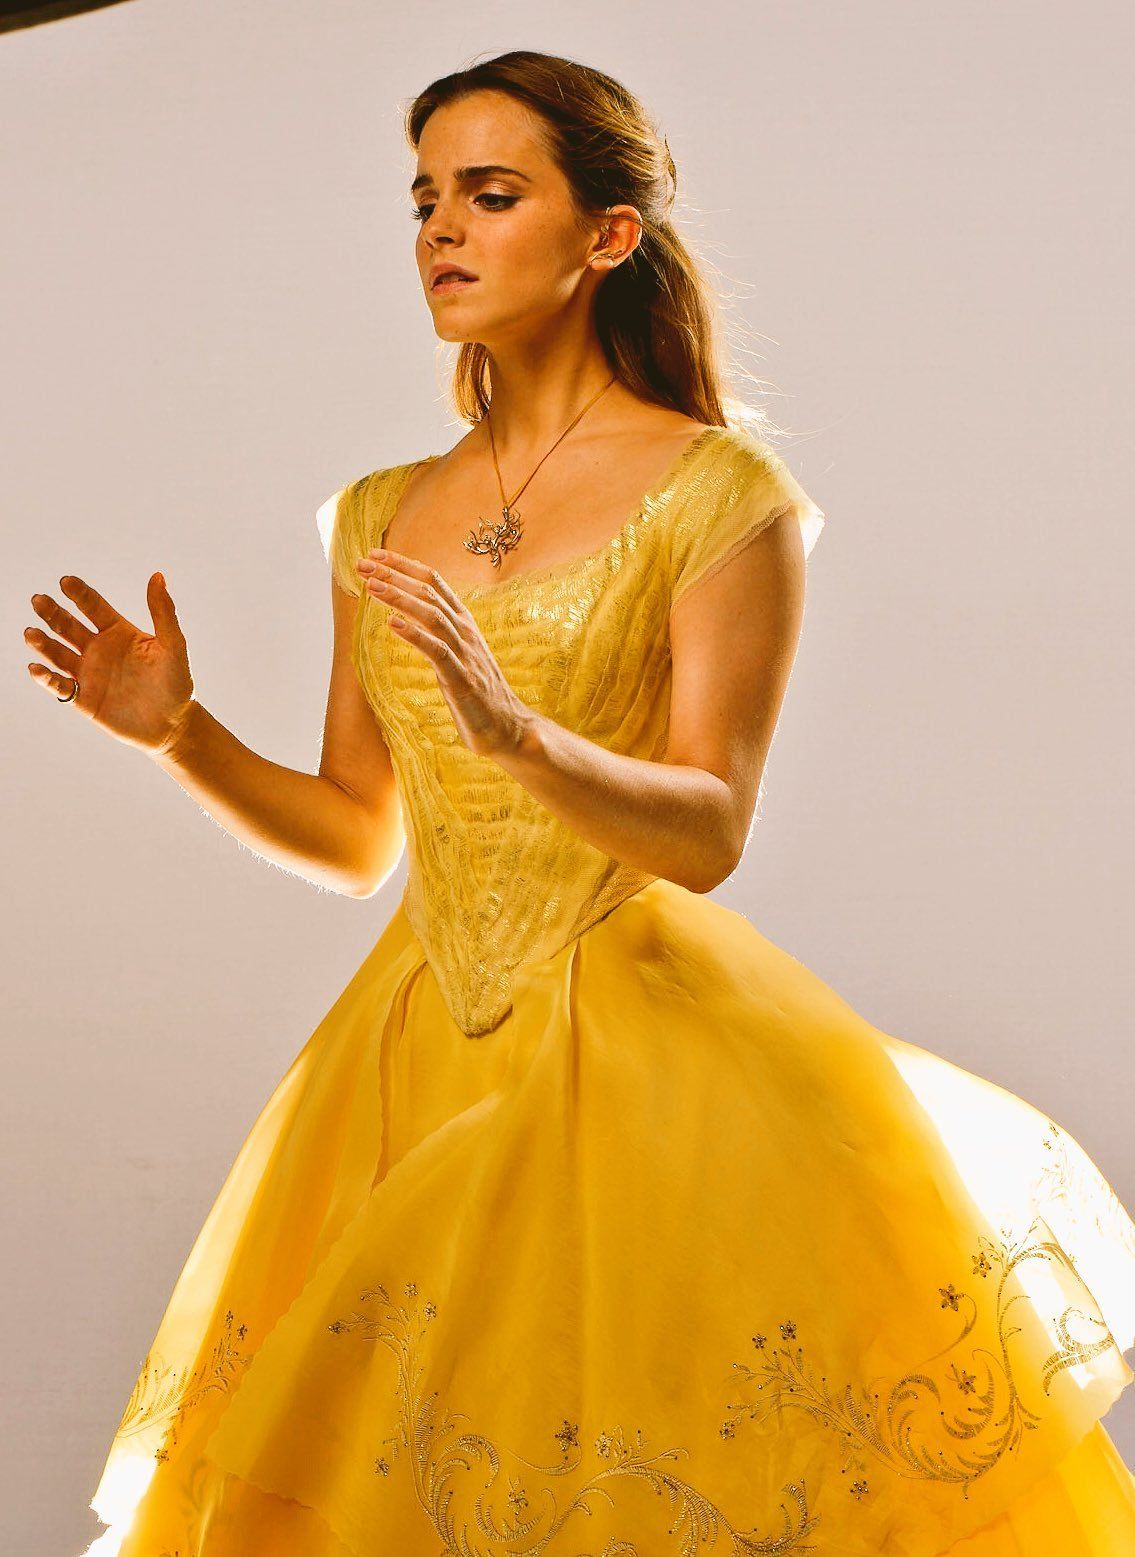 Exceptional Gabtoru0027s Cool World U2014 Emma Watson As Belle: Beauty And The Beast Costume